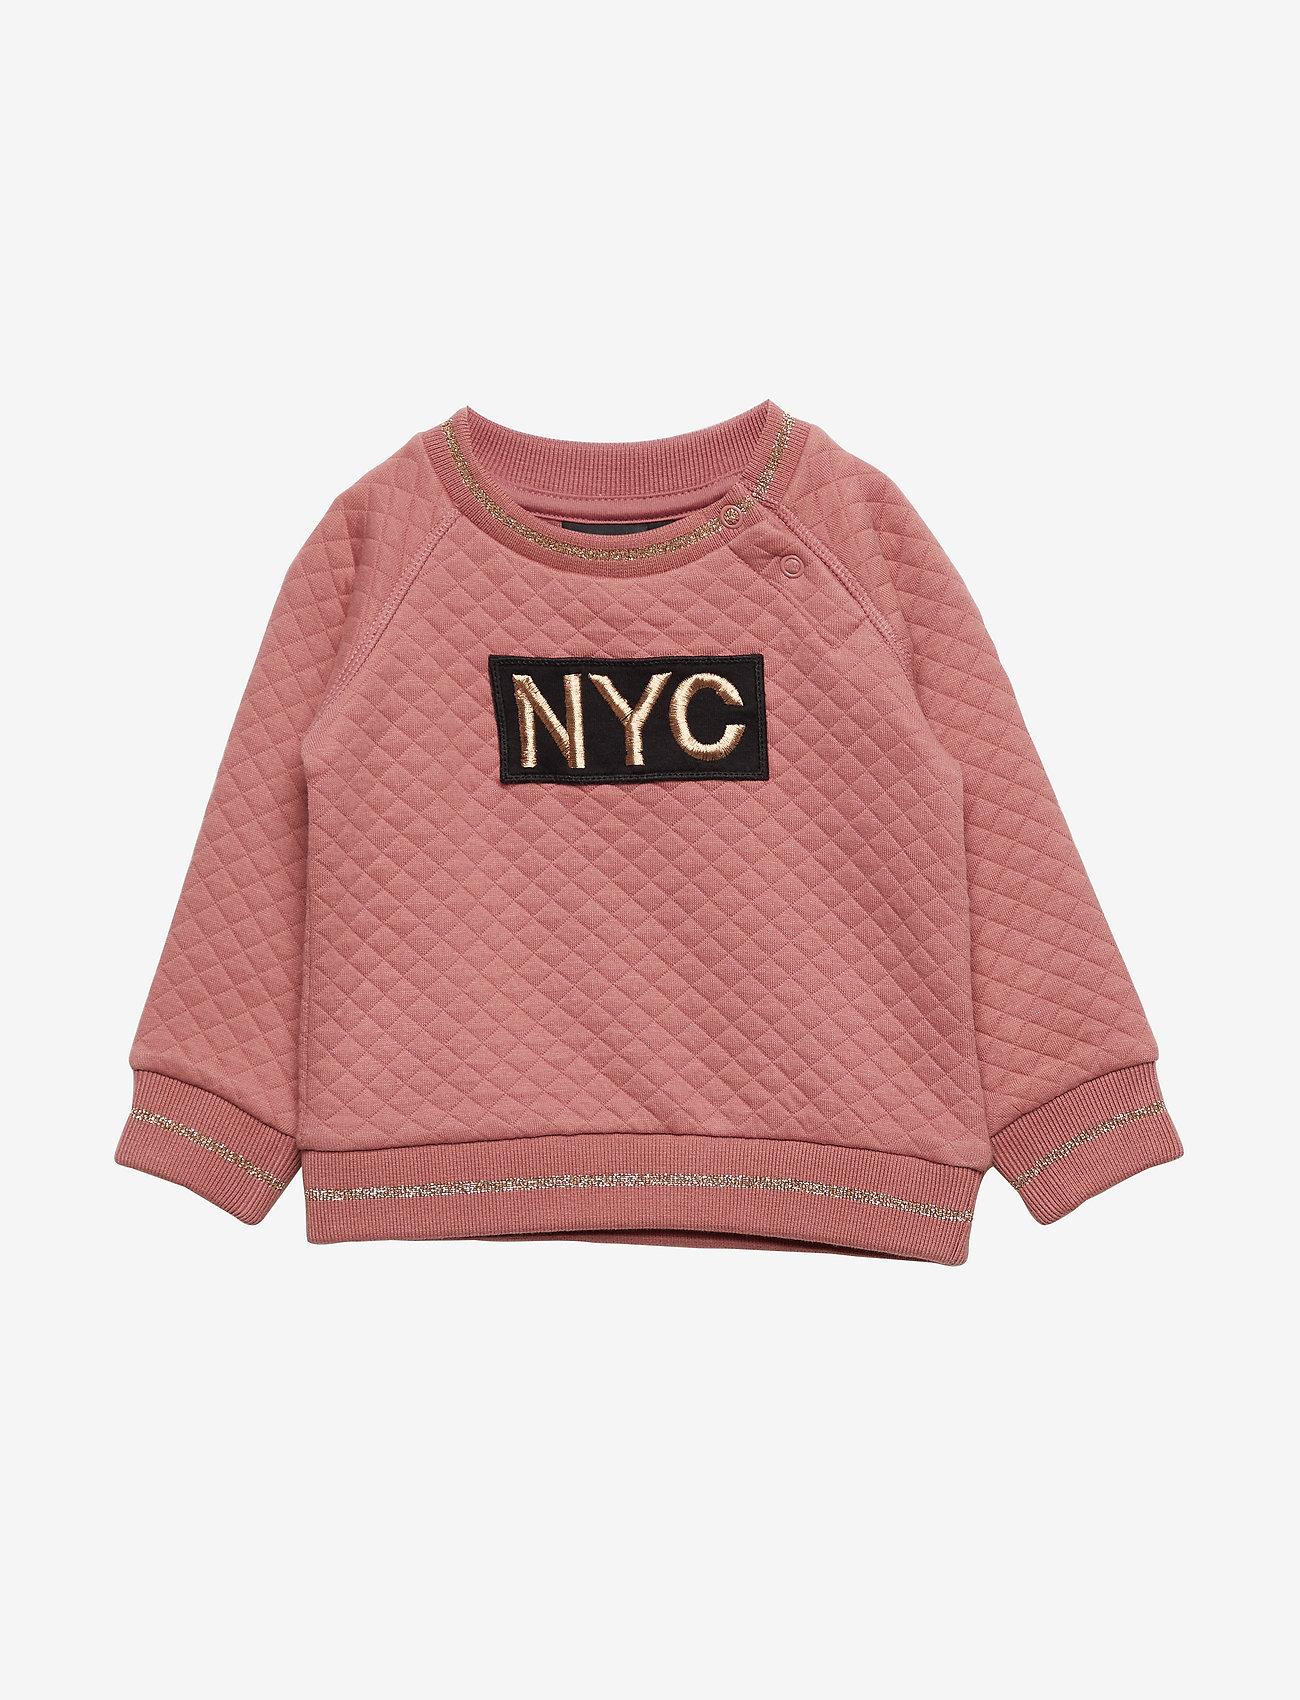 Petit by Sofie Schnoor - Sweat NYC - sweatshirts - dusty rose - 0